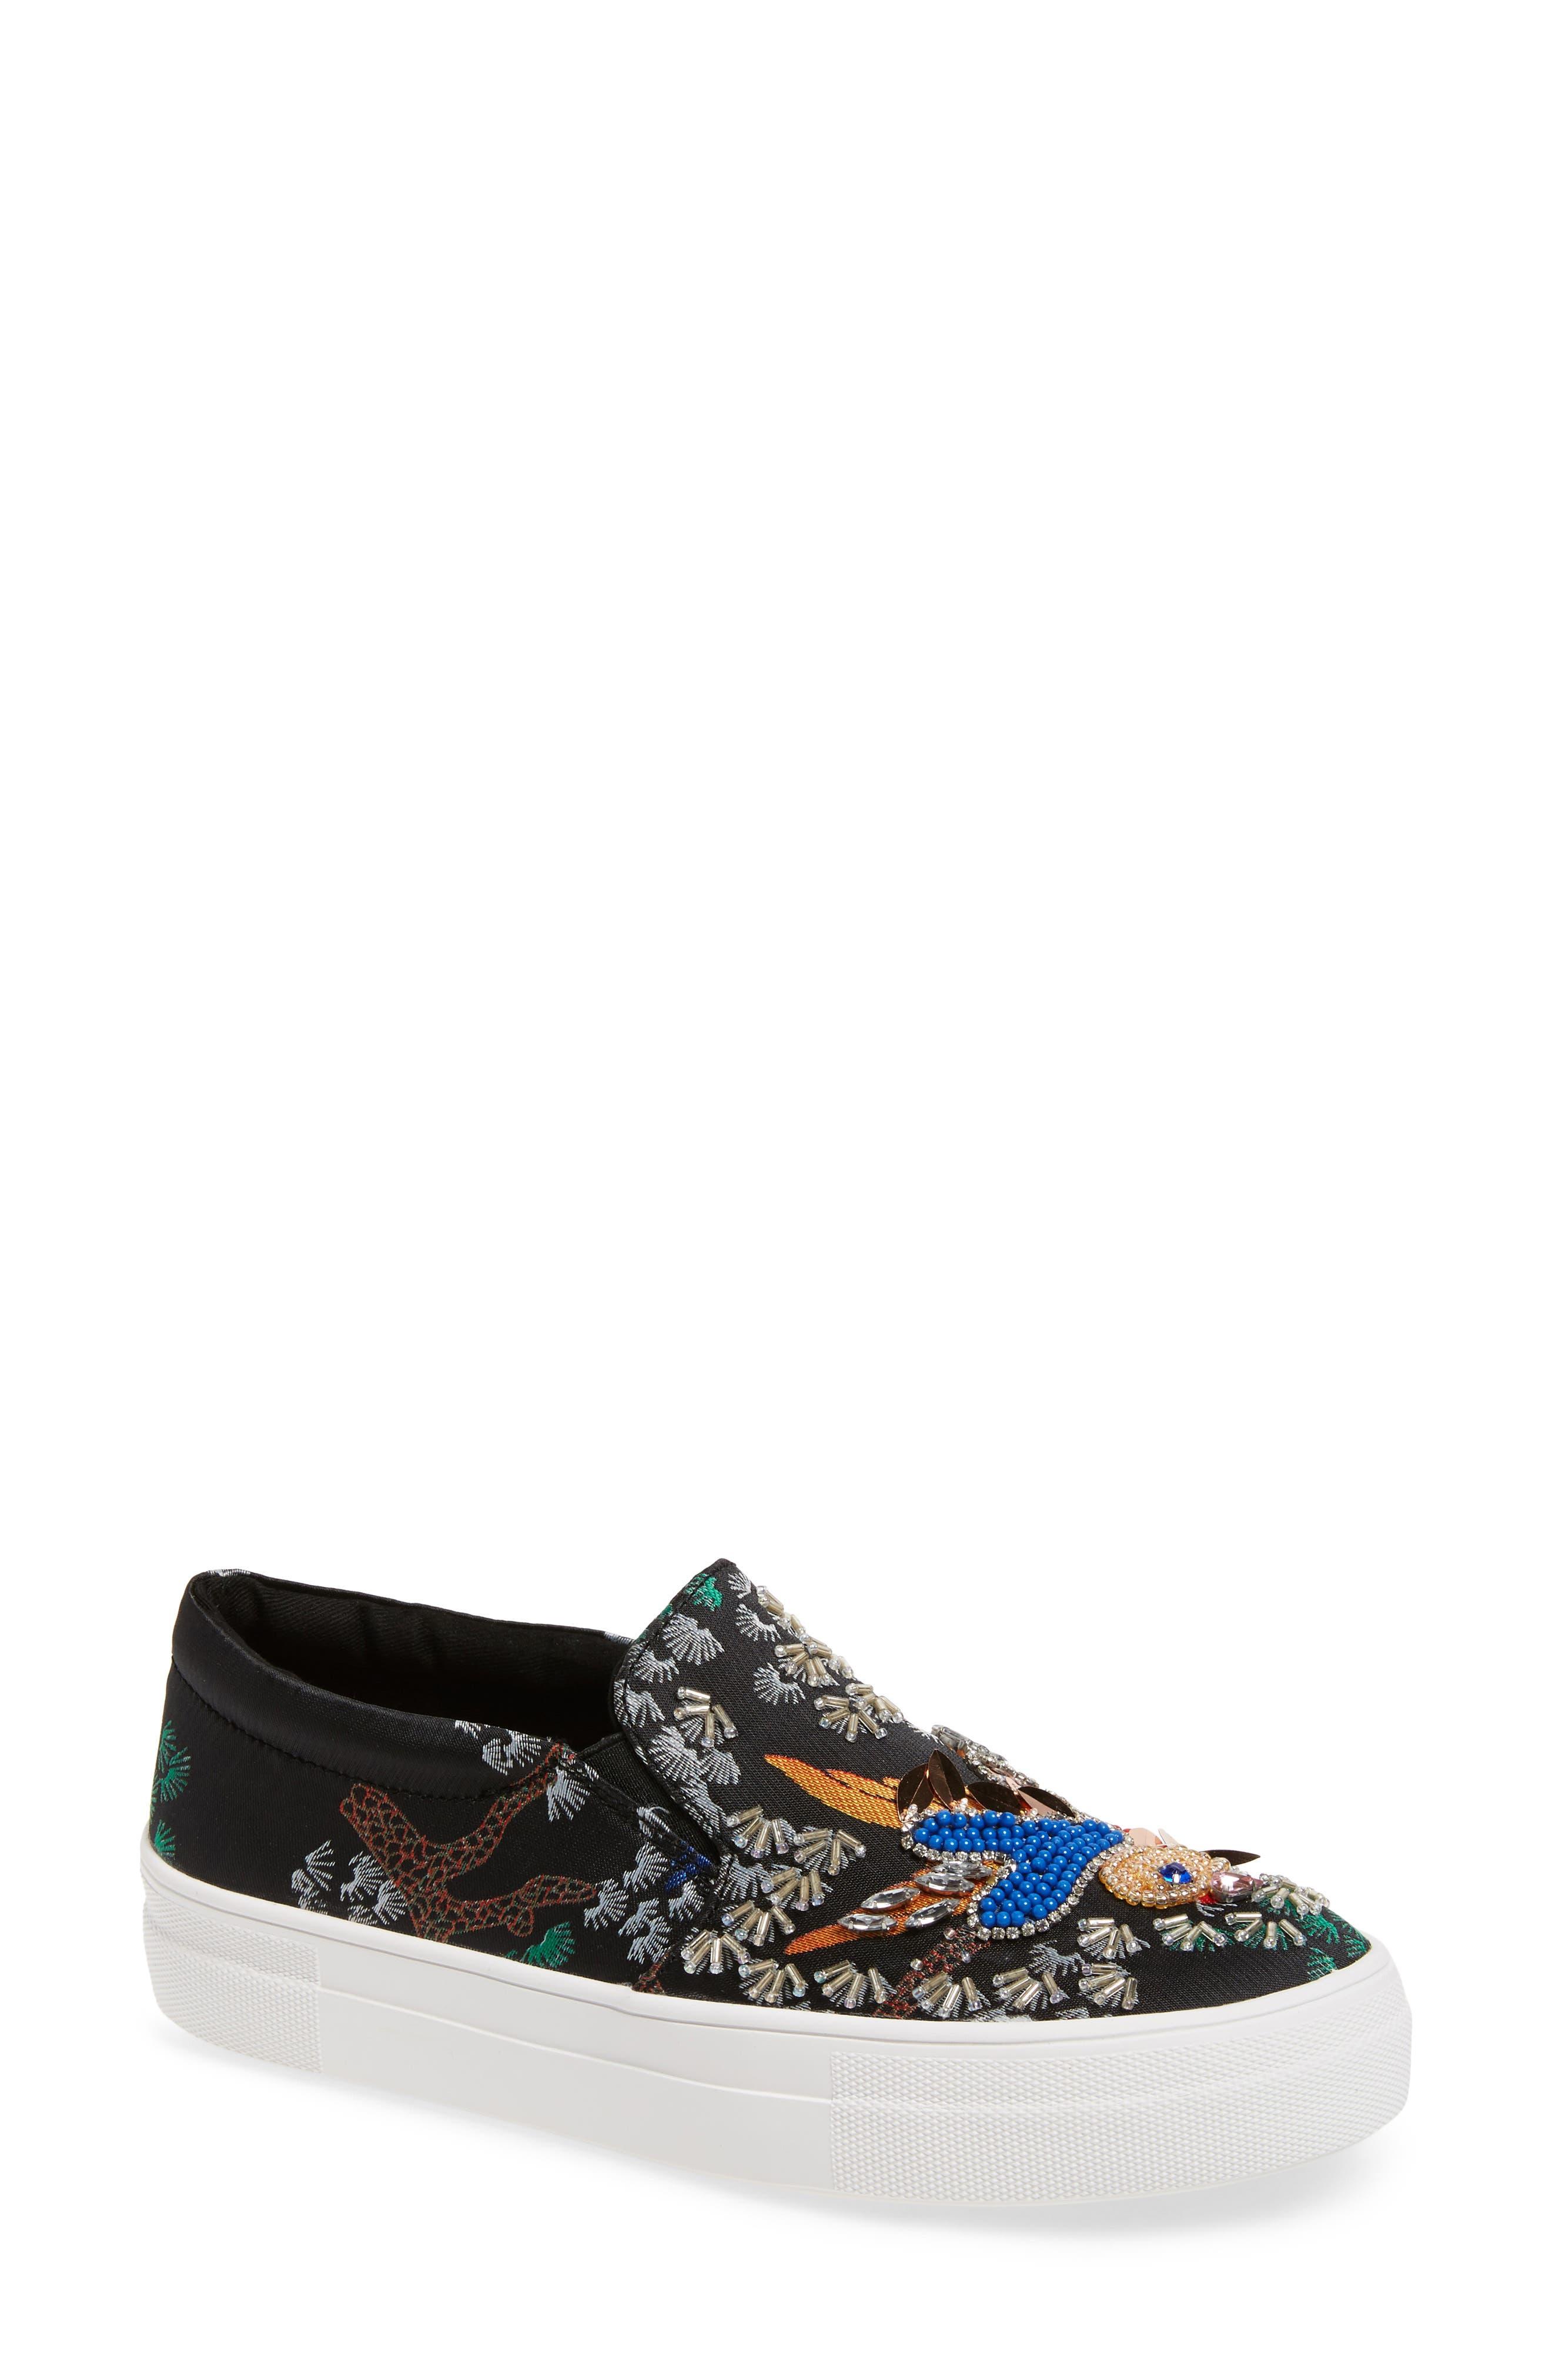 Steve Madden Gwen Embellished Slip-On Platform Sneaker (Women)